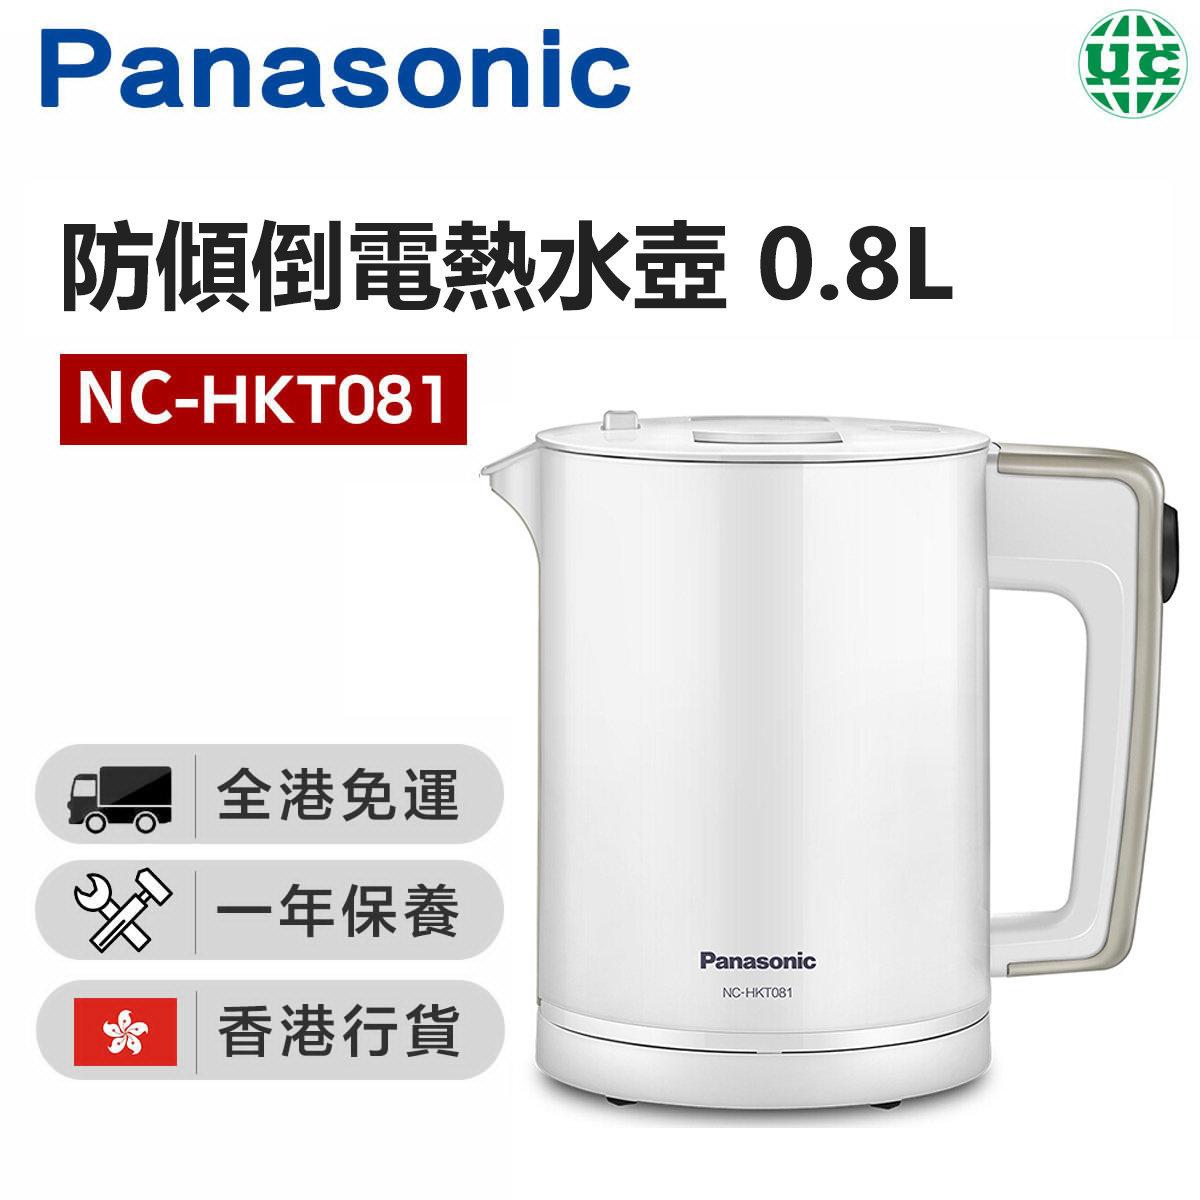 NC-HKT081 Electric Kettle 0.8L-white (Hong Kong licensed)